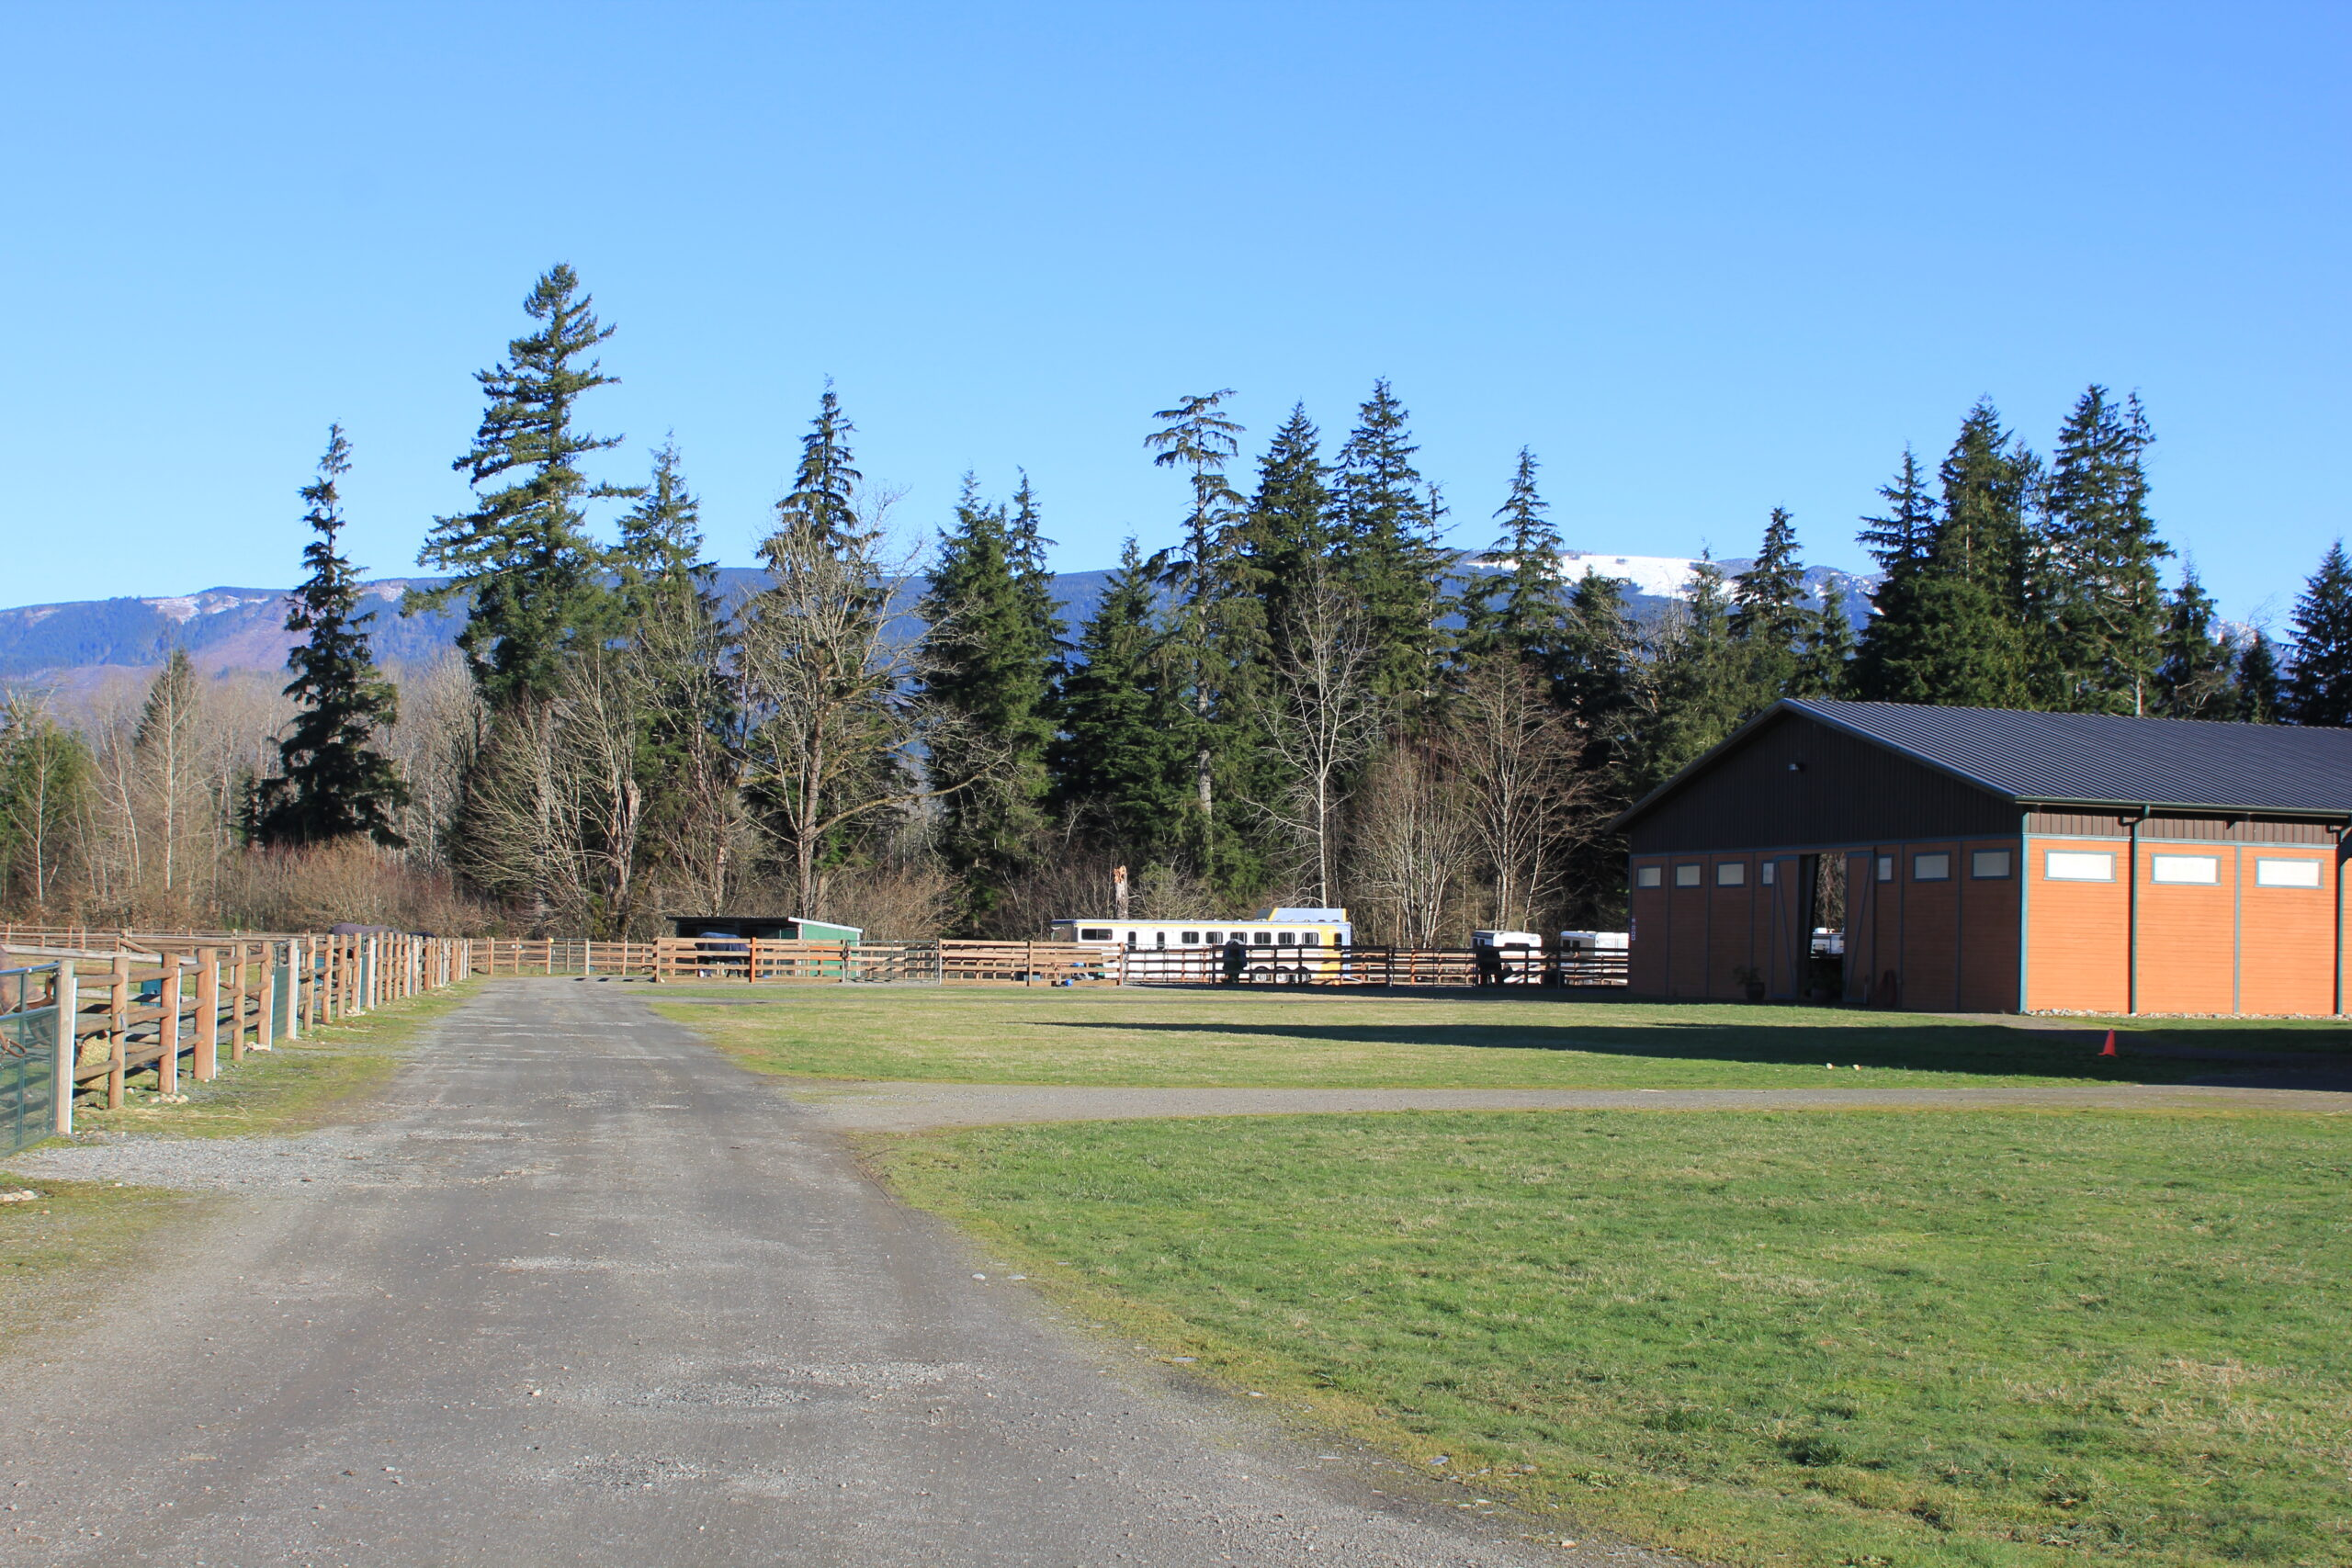 Driveway to barn